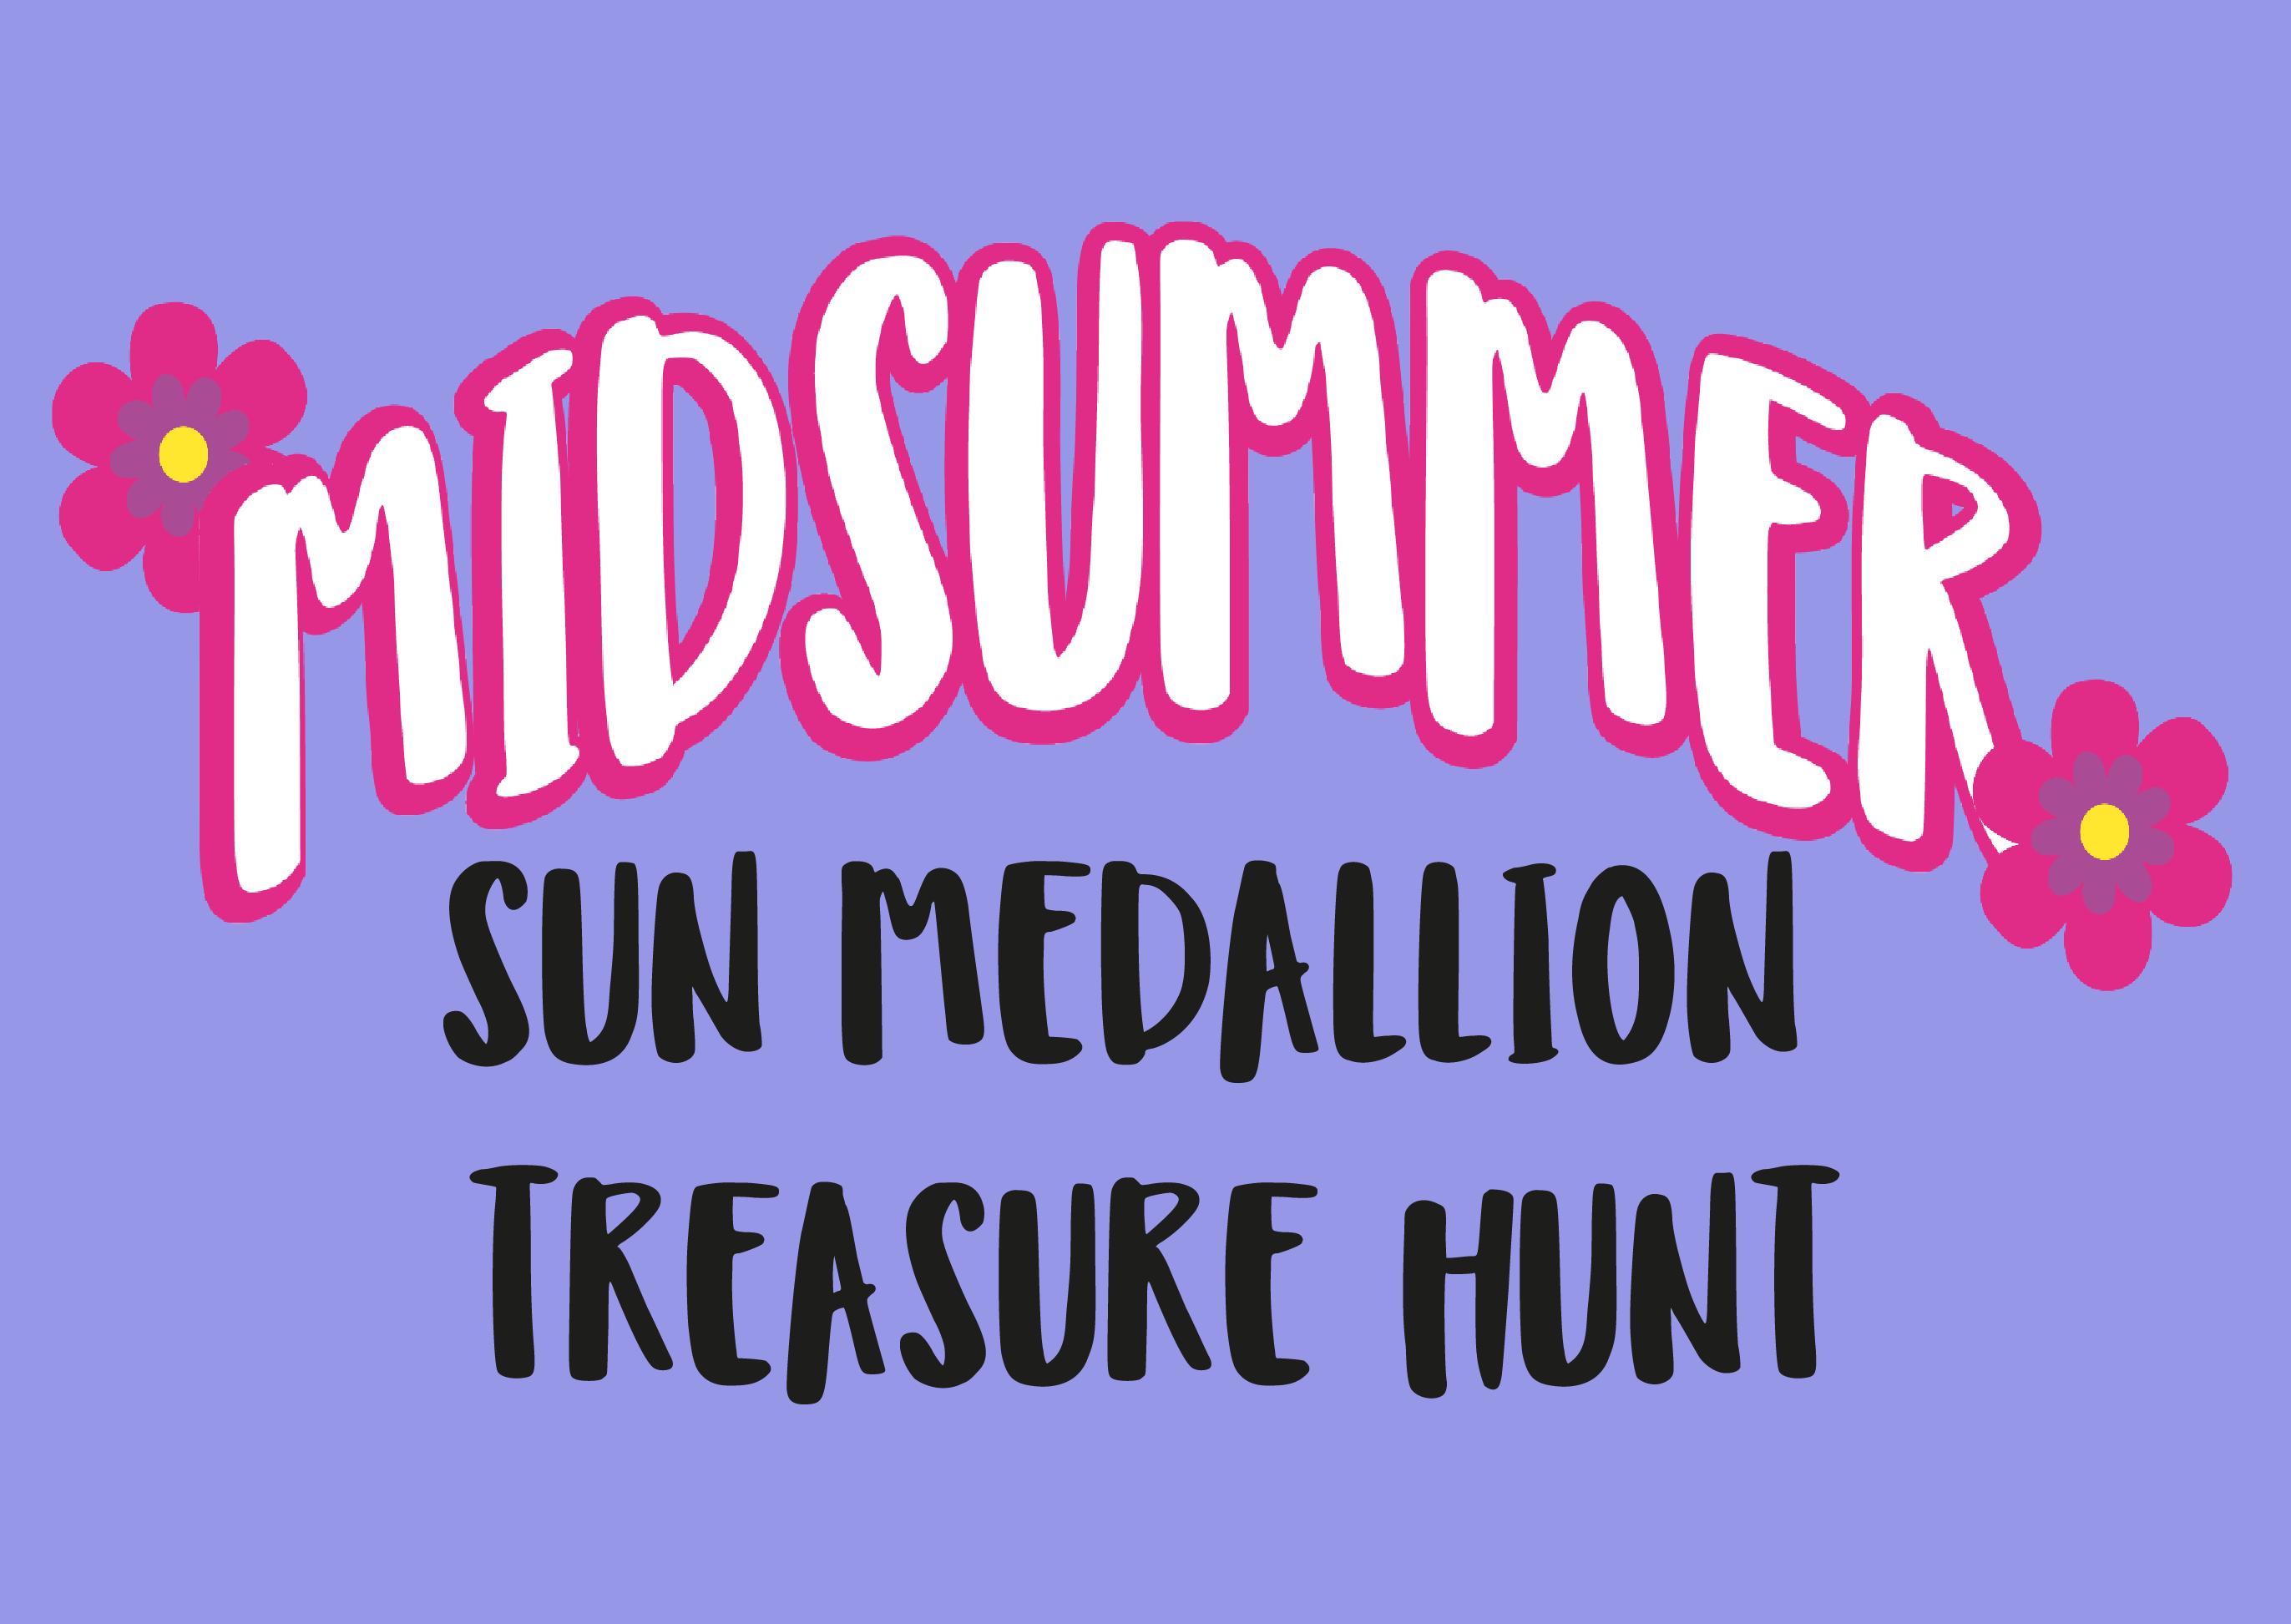 image relating to Sun Medallion Treasure Hunt